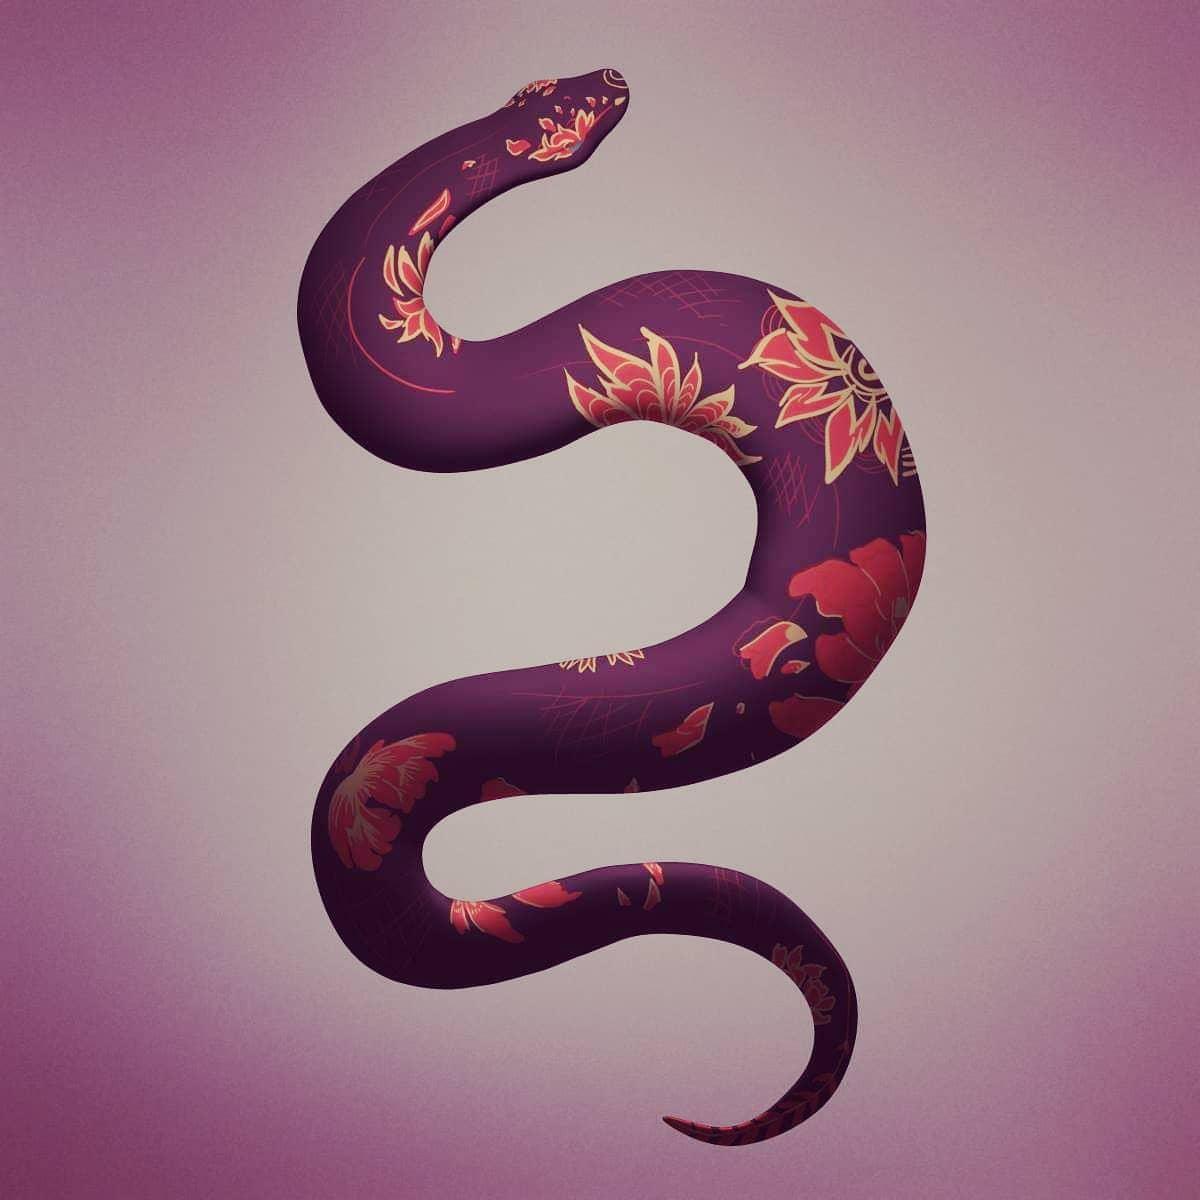 Day 26 of #sculptober2020 #extend - a gorgeous snake. Original concept by Avril Jullien on Artstation #3d #3dart #3dmodel #zbrush #zbrushsculpt https://t.co/lqXY3pJqIx